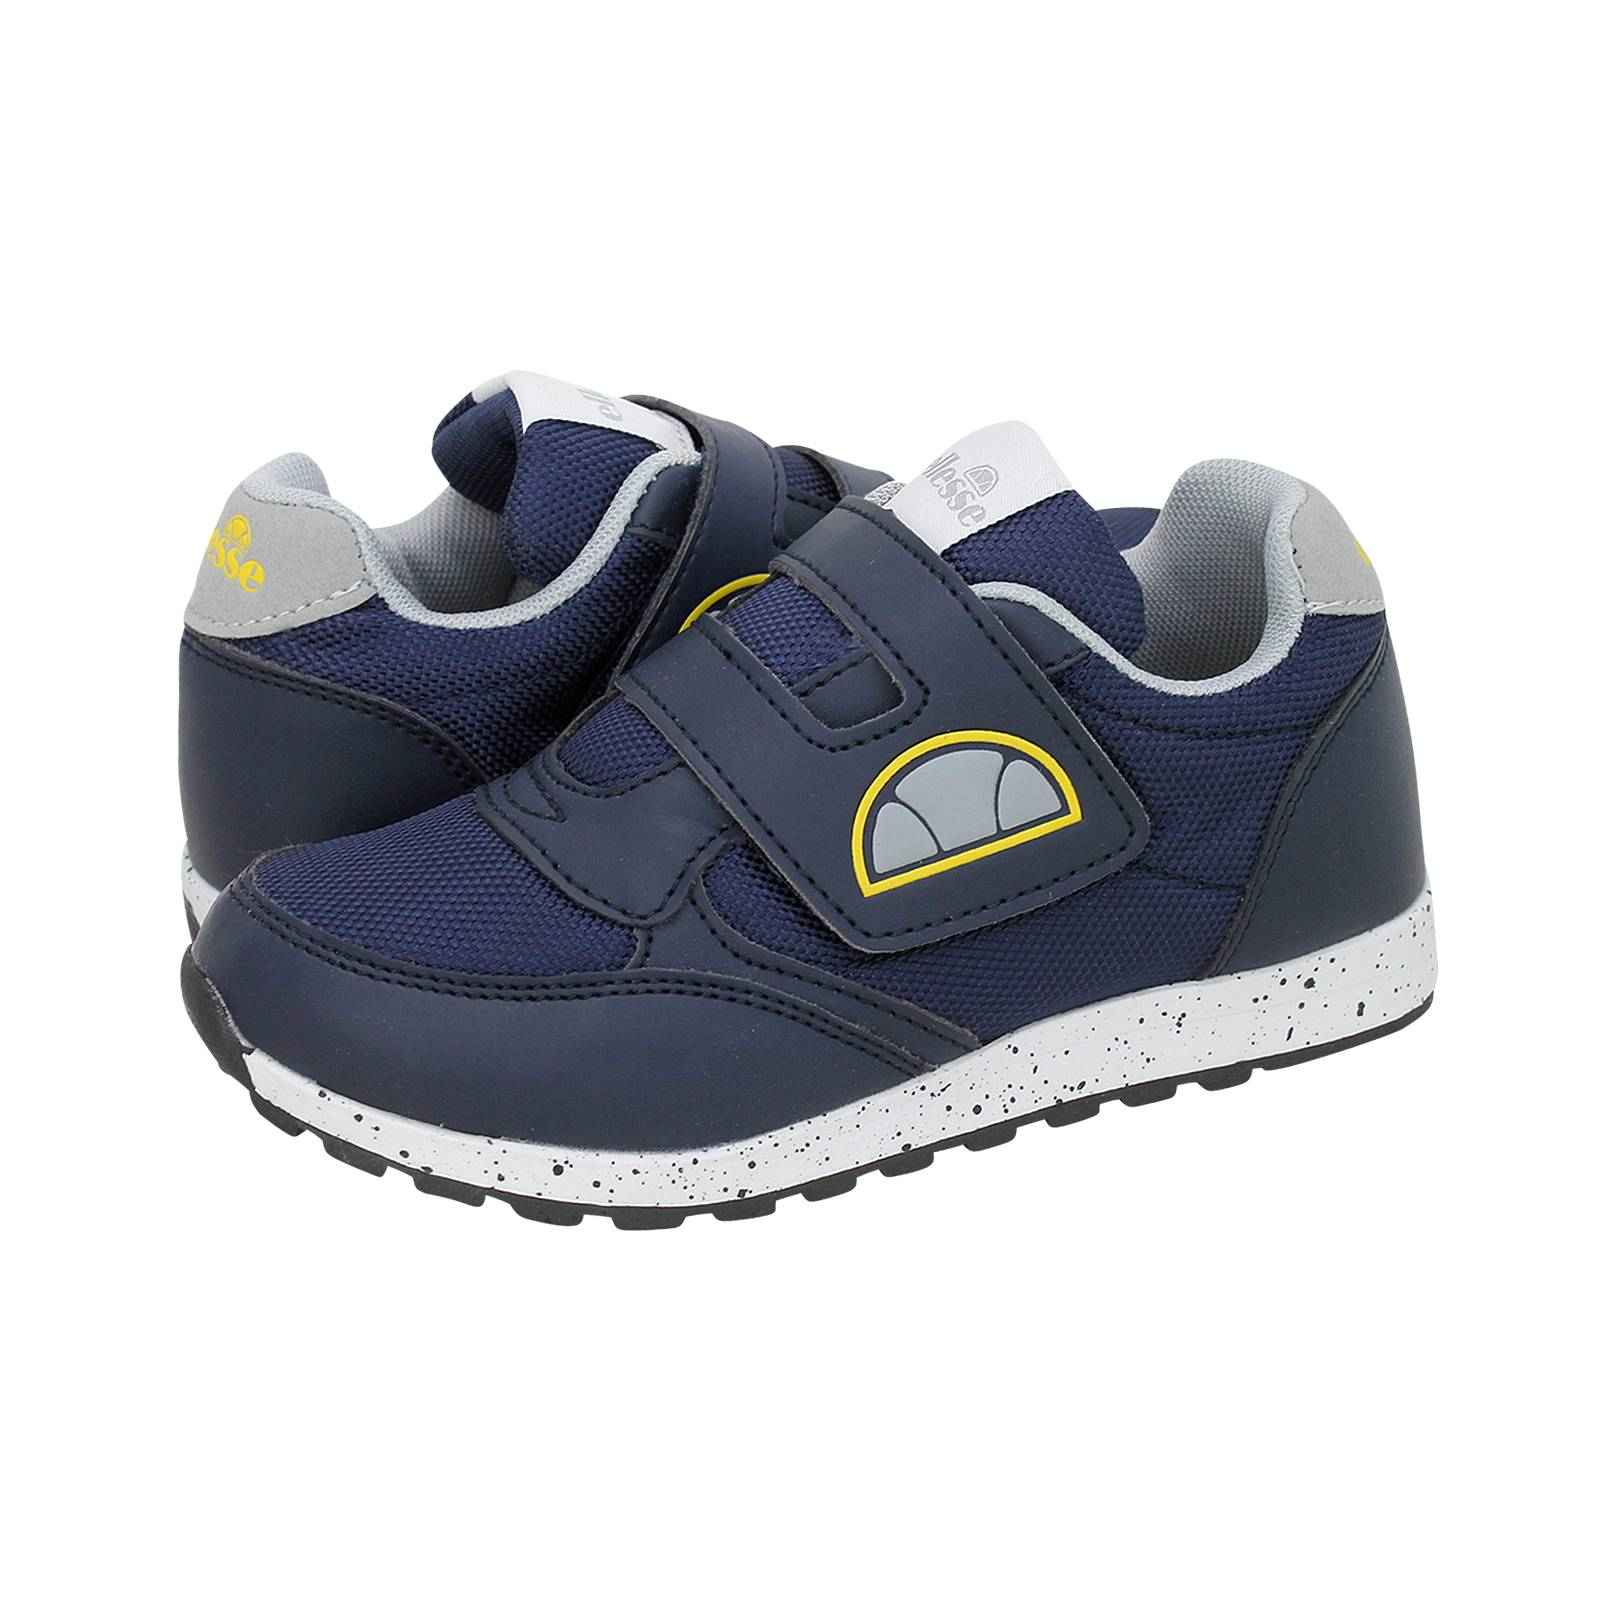 24b8451b373 Αθλητικά Παιδικά Παπούτσια Ellesse HB-ELS08